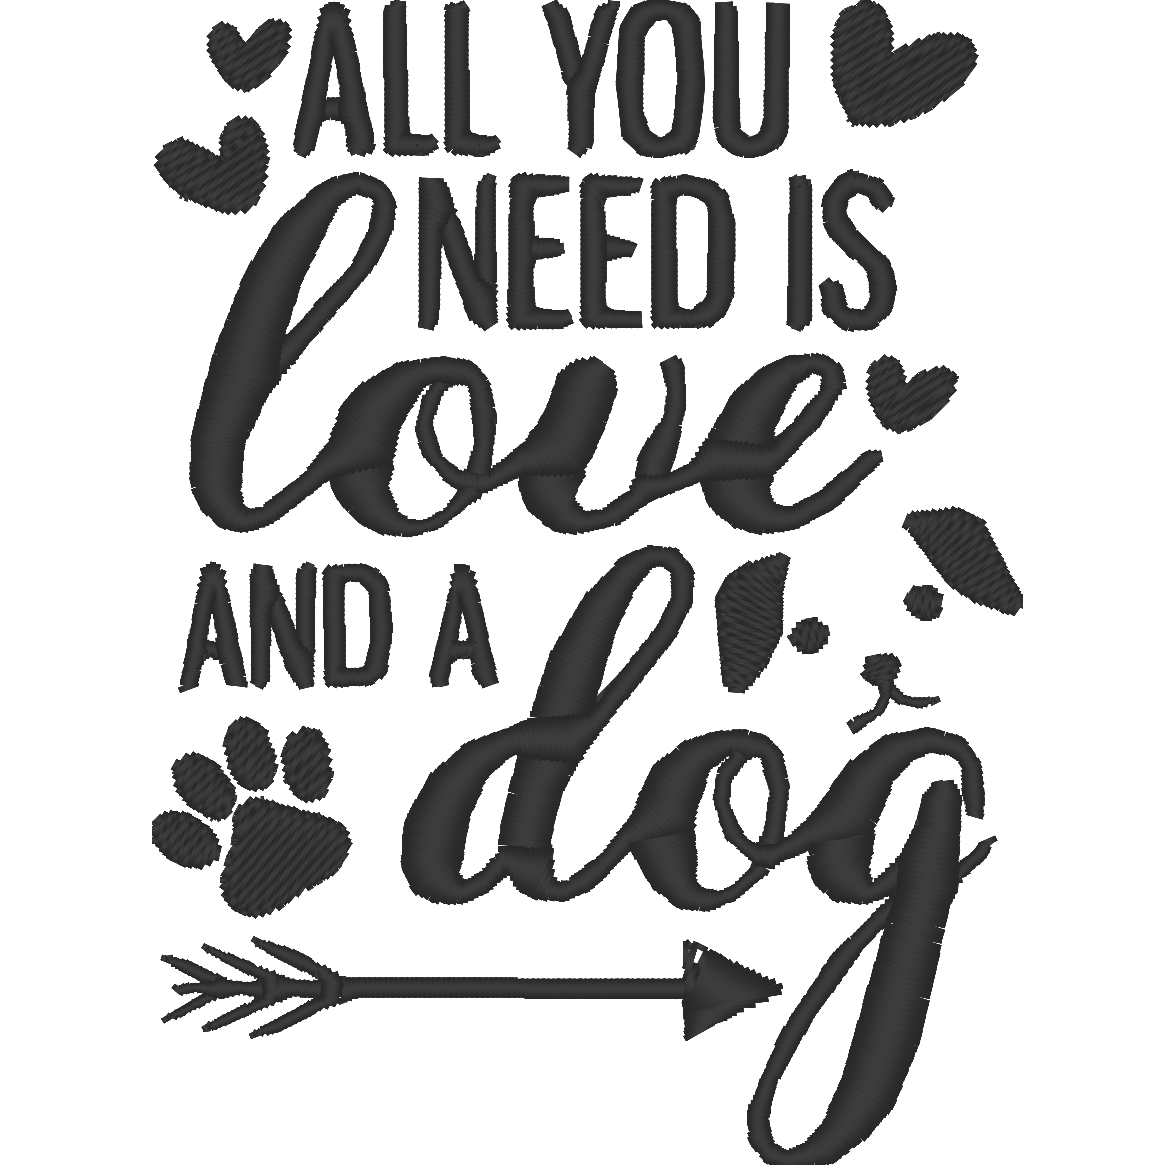 All_you_need_is_loveobPMdn1H1qTjH